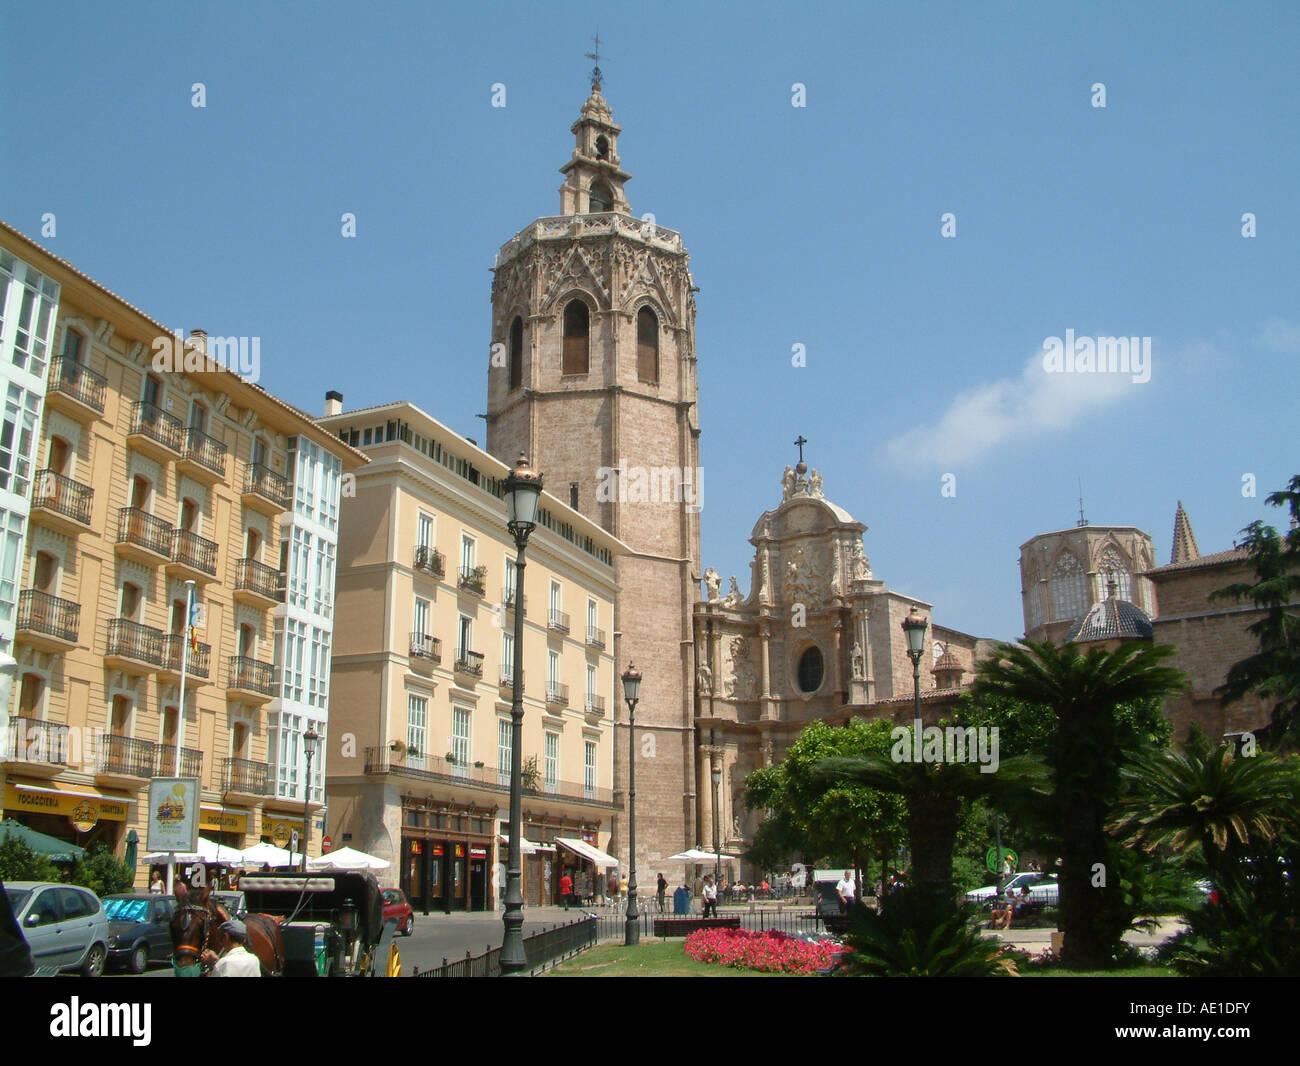 Cathedral, Plaza de la Reina, Valencia, Spain Stock Photo